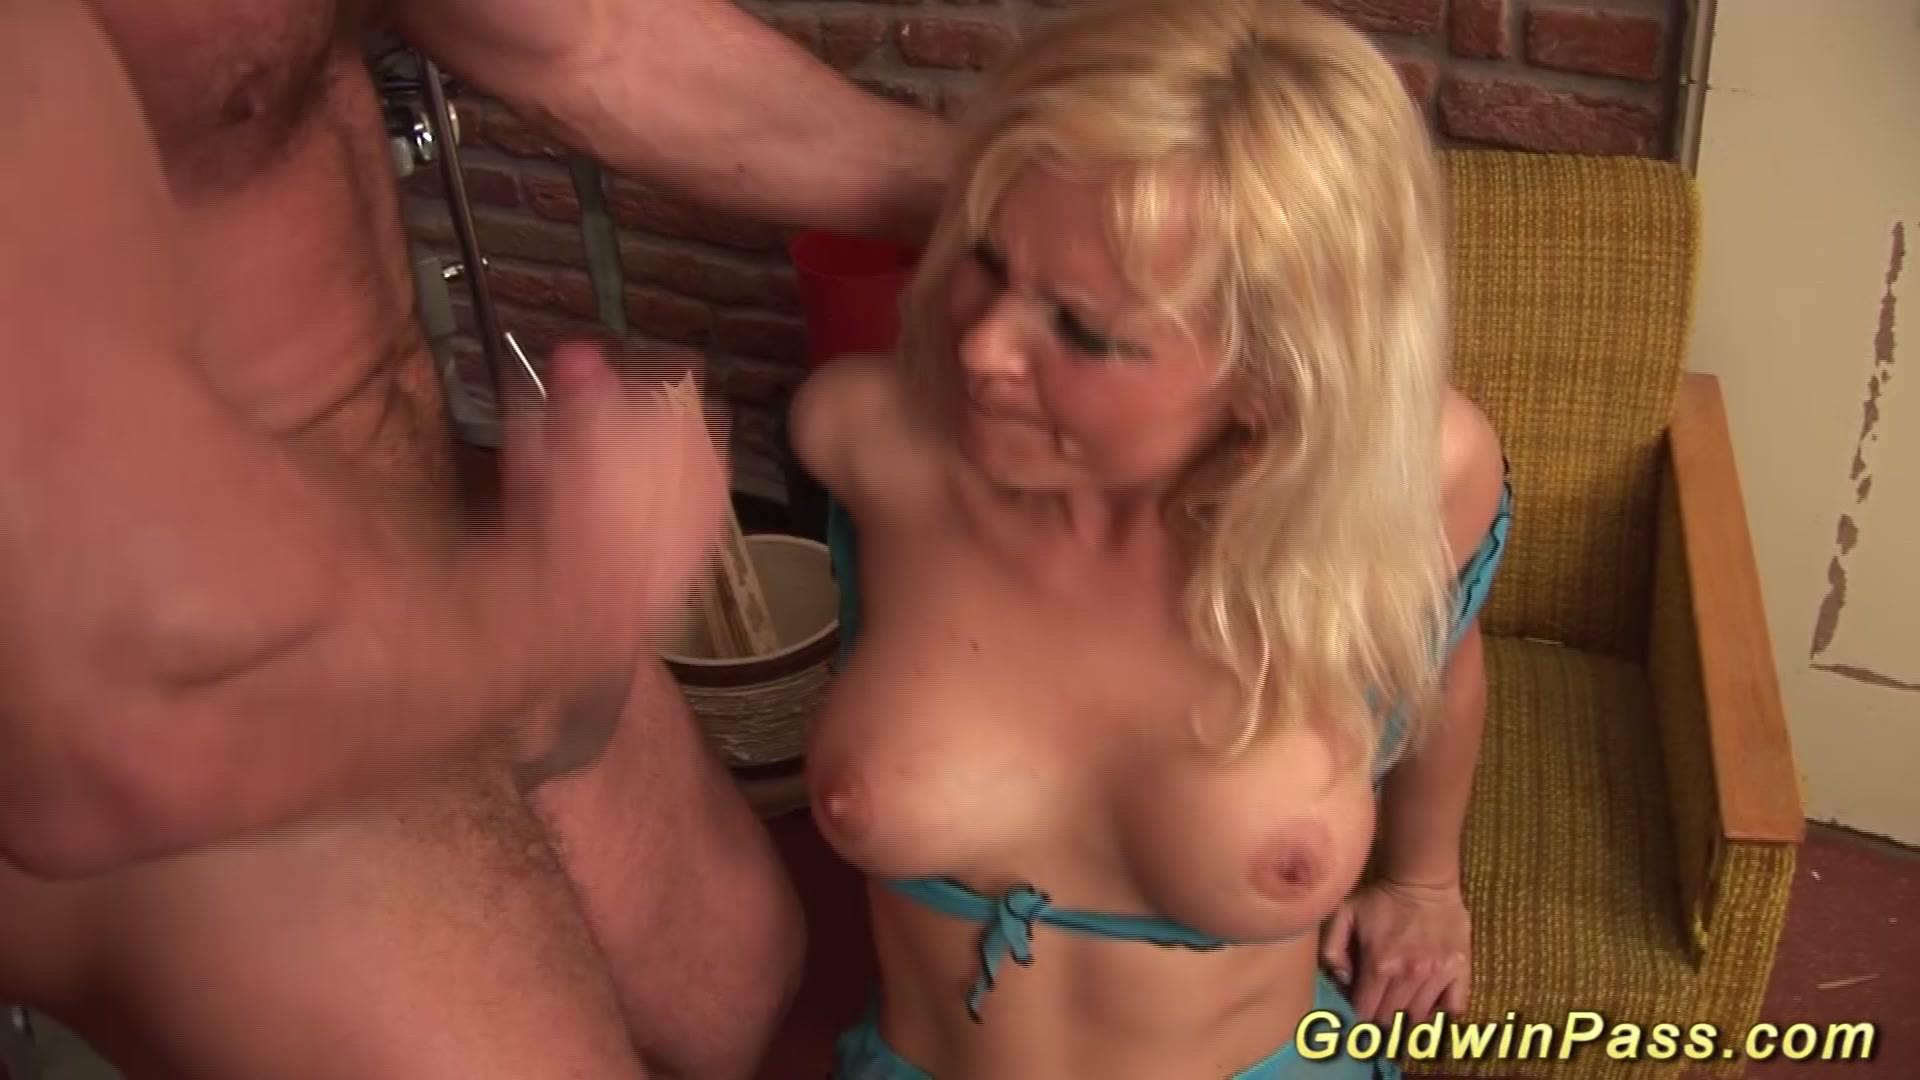 Nude gallery Sexy thick latina fucked hard